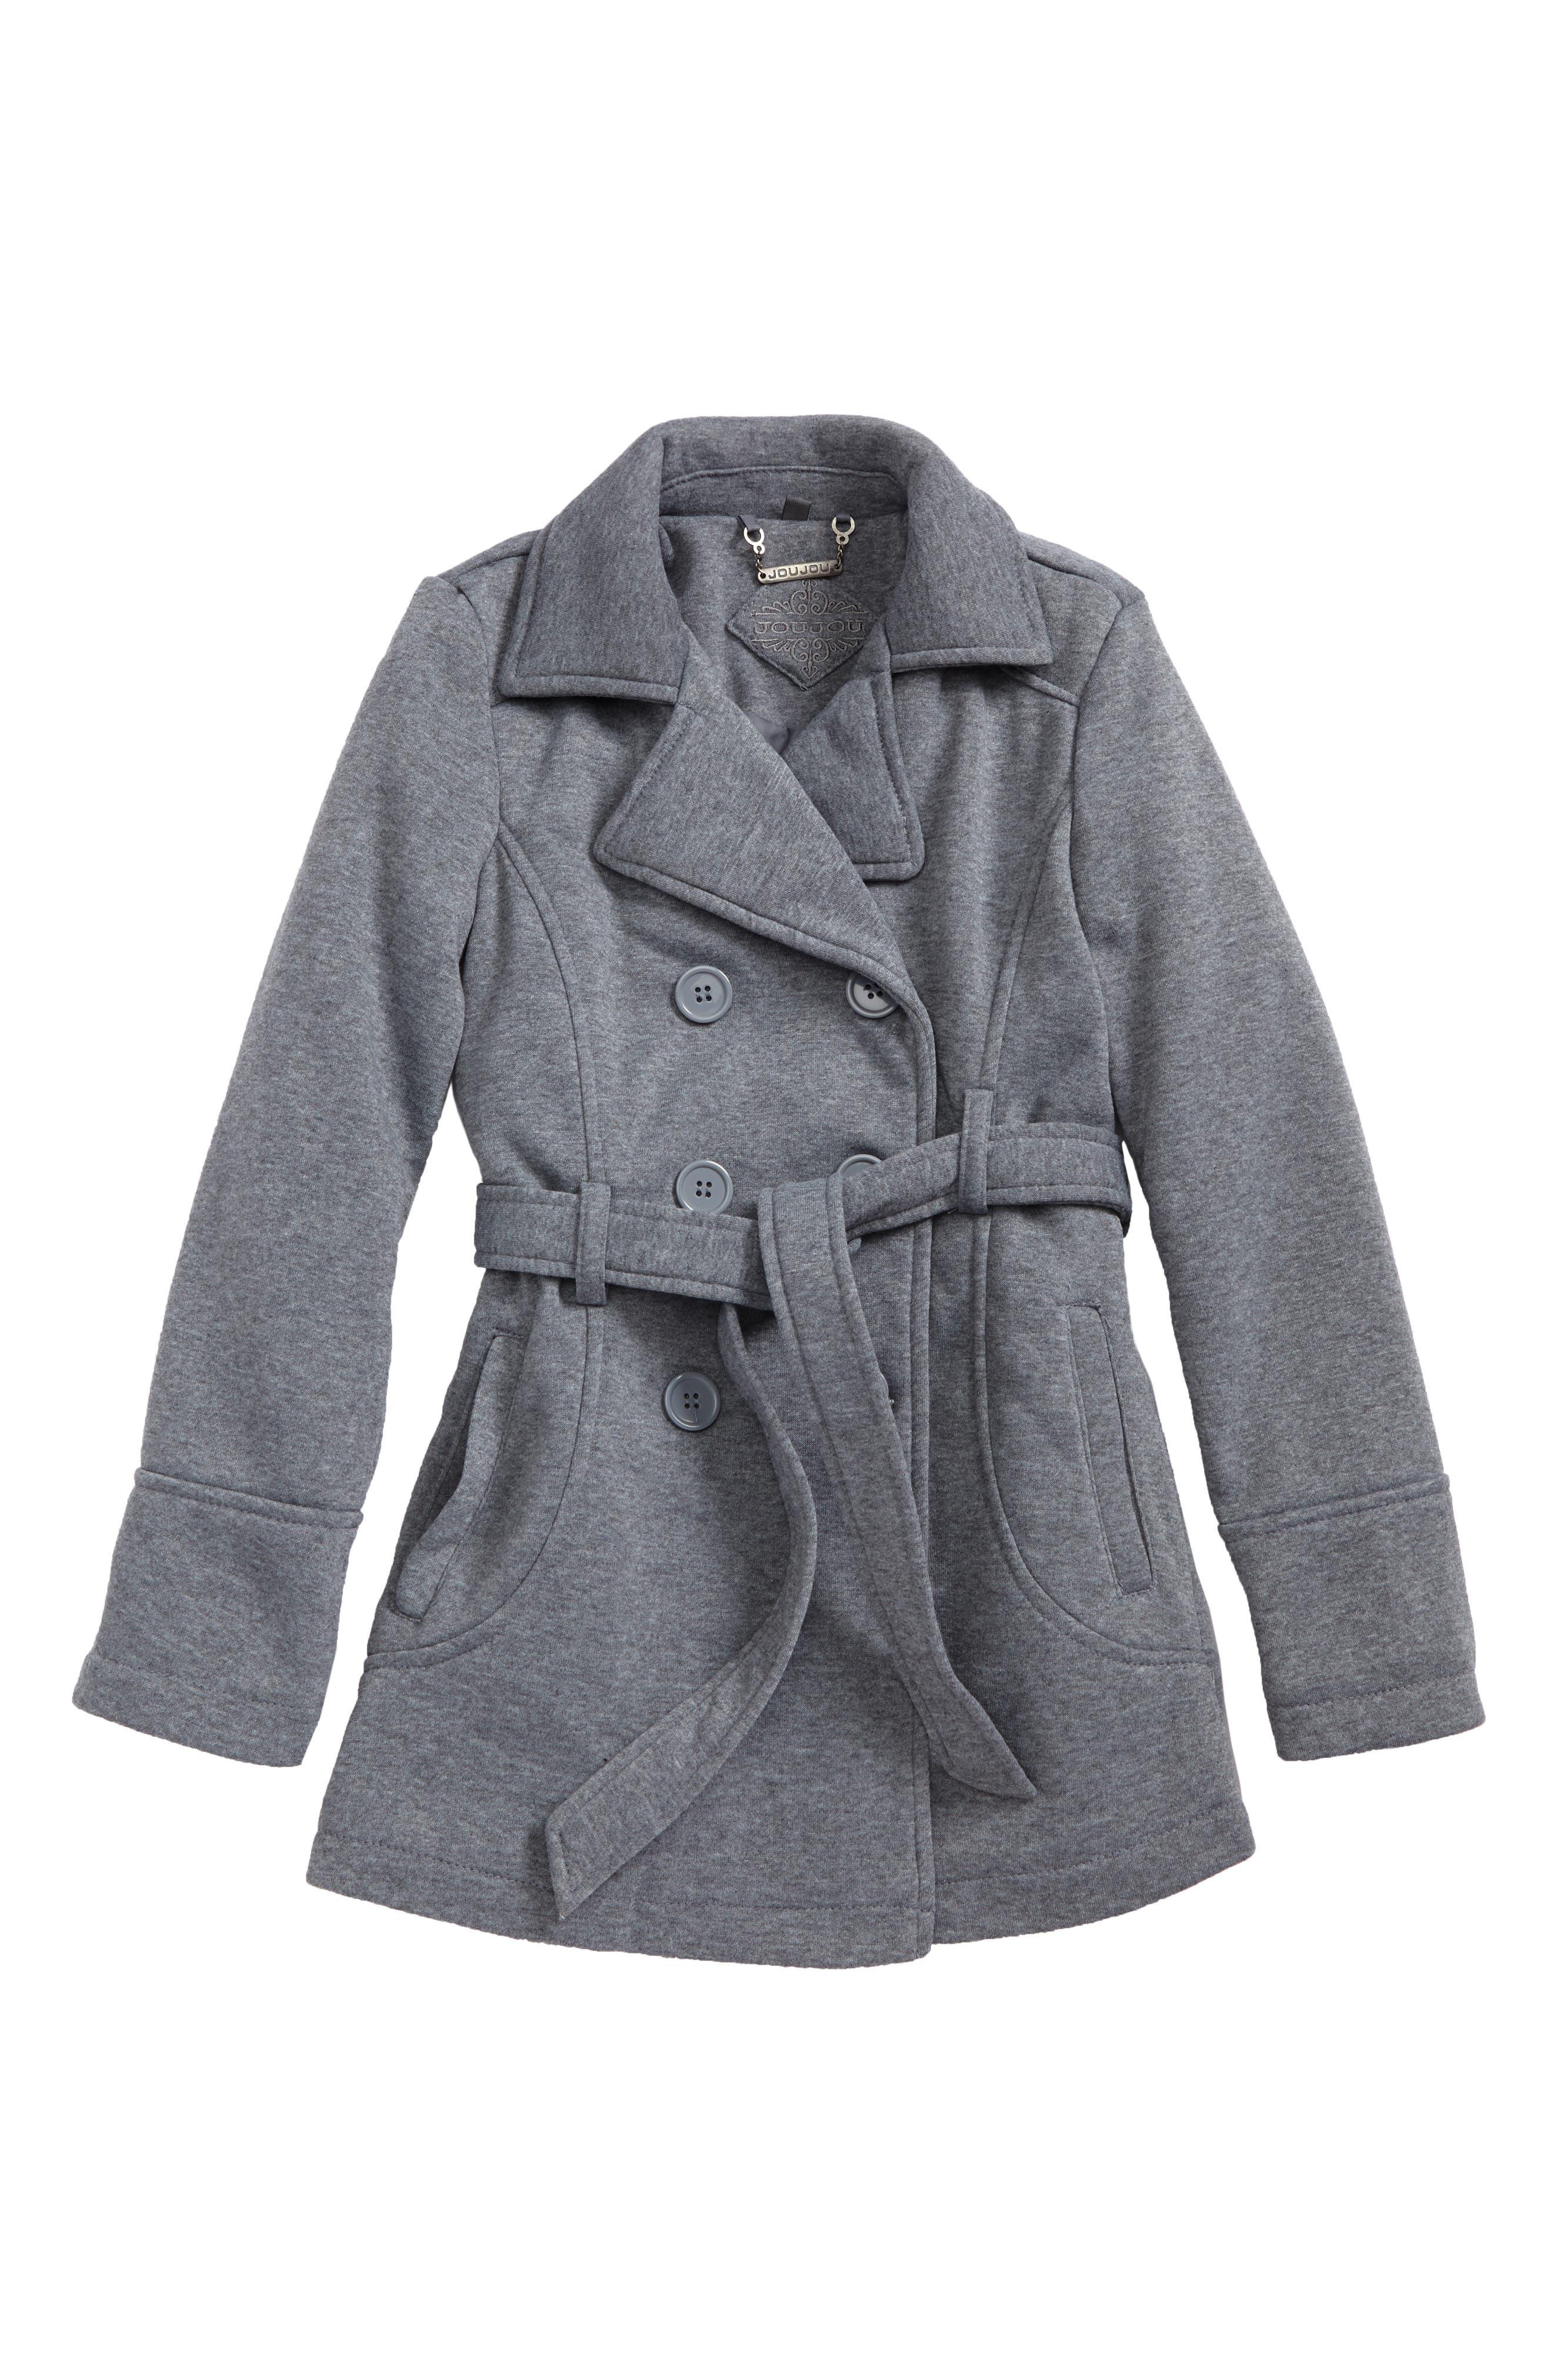 Alternate Image 1 Selected - Jou Jou Double-Breasted Coat (Big Girls)